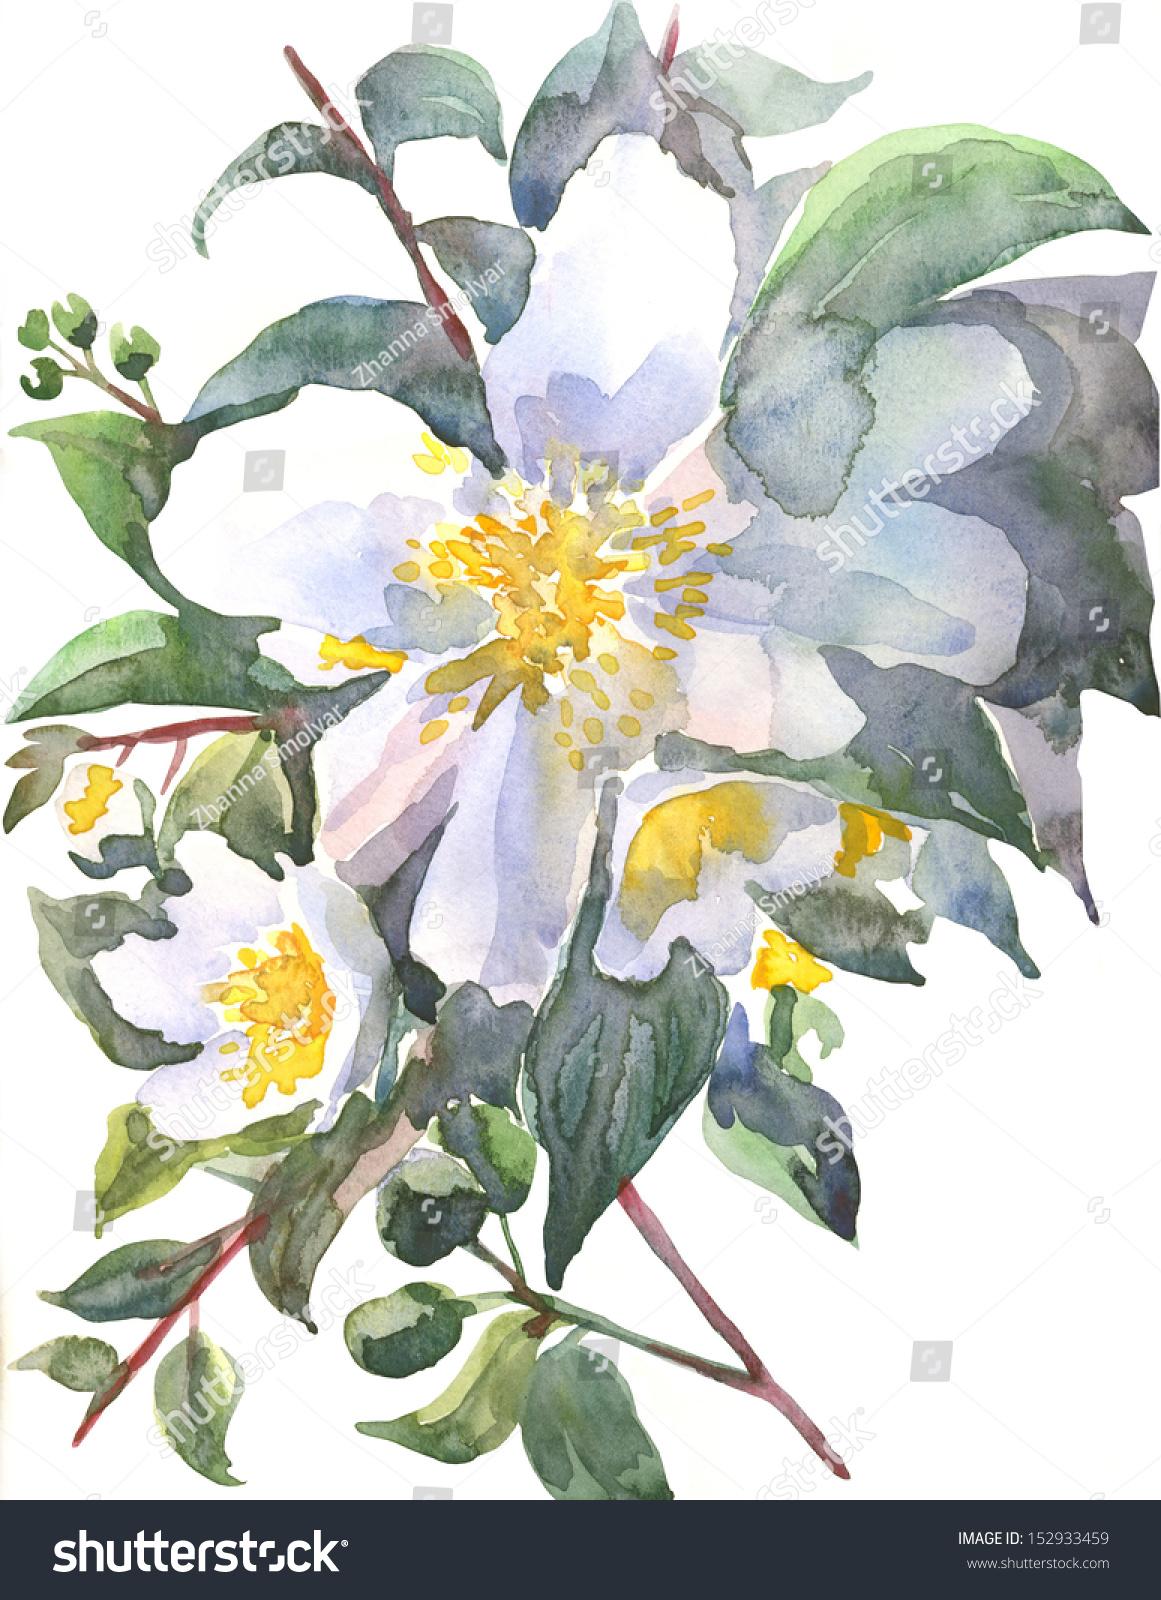 Jasmine white flowers stock illustration 152933459 shutterstock jasmine white flowers izmirmasajfo